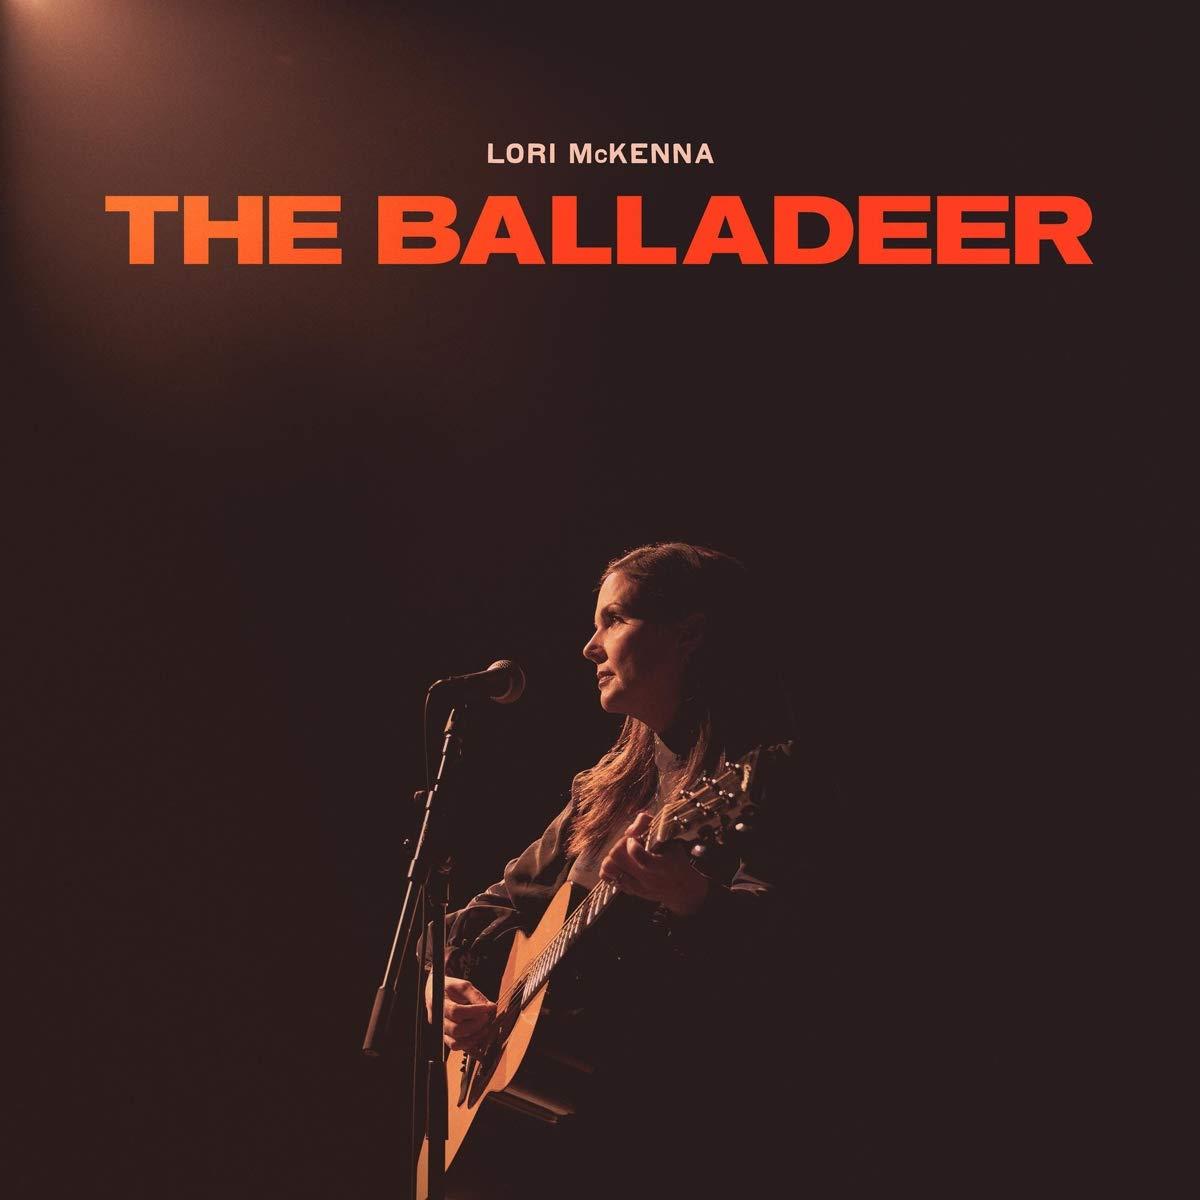 LORI McKENNA - The Balladeer